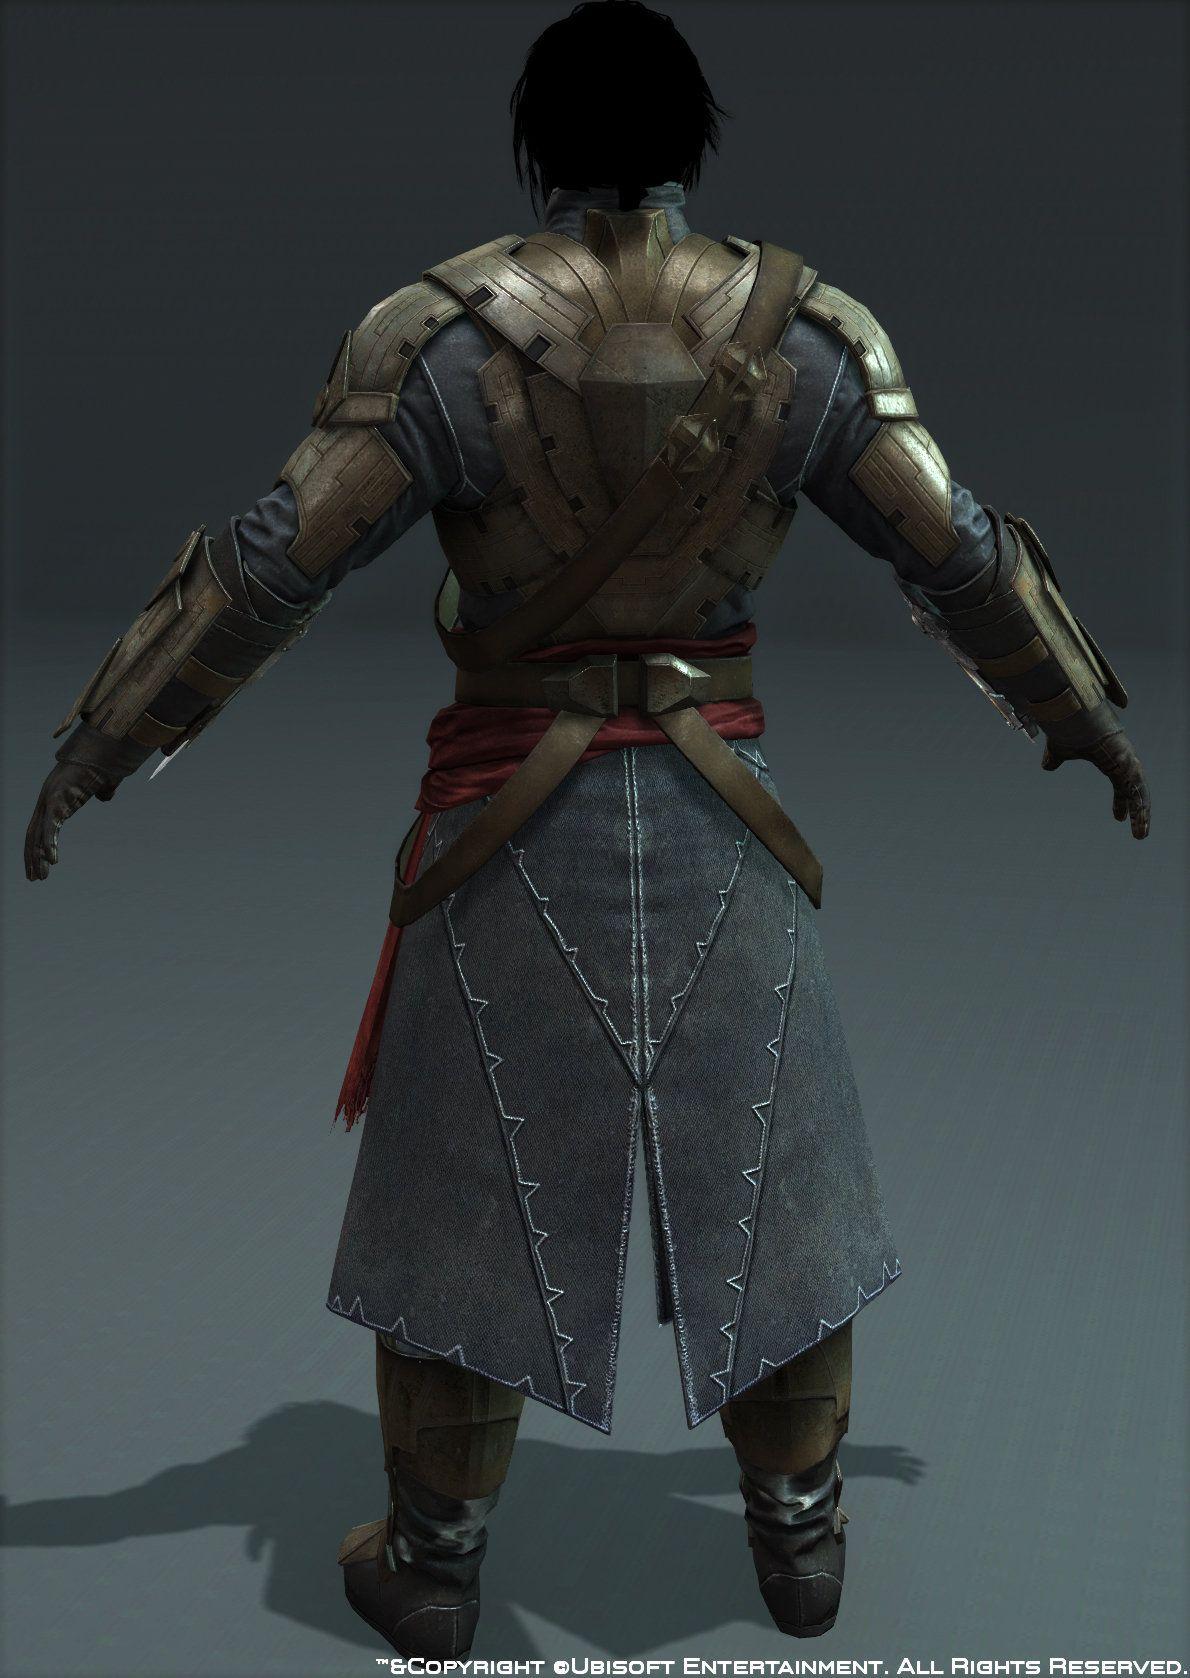 Artstation Assasin S Creed Black Flag Edward Kenway Mayan Outfit Mathieu Goulet Assassins Creed Assassins Creed Black Flag Assasins Creed